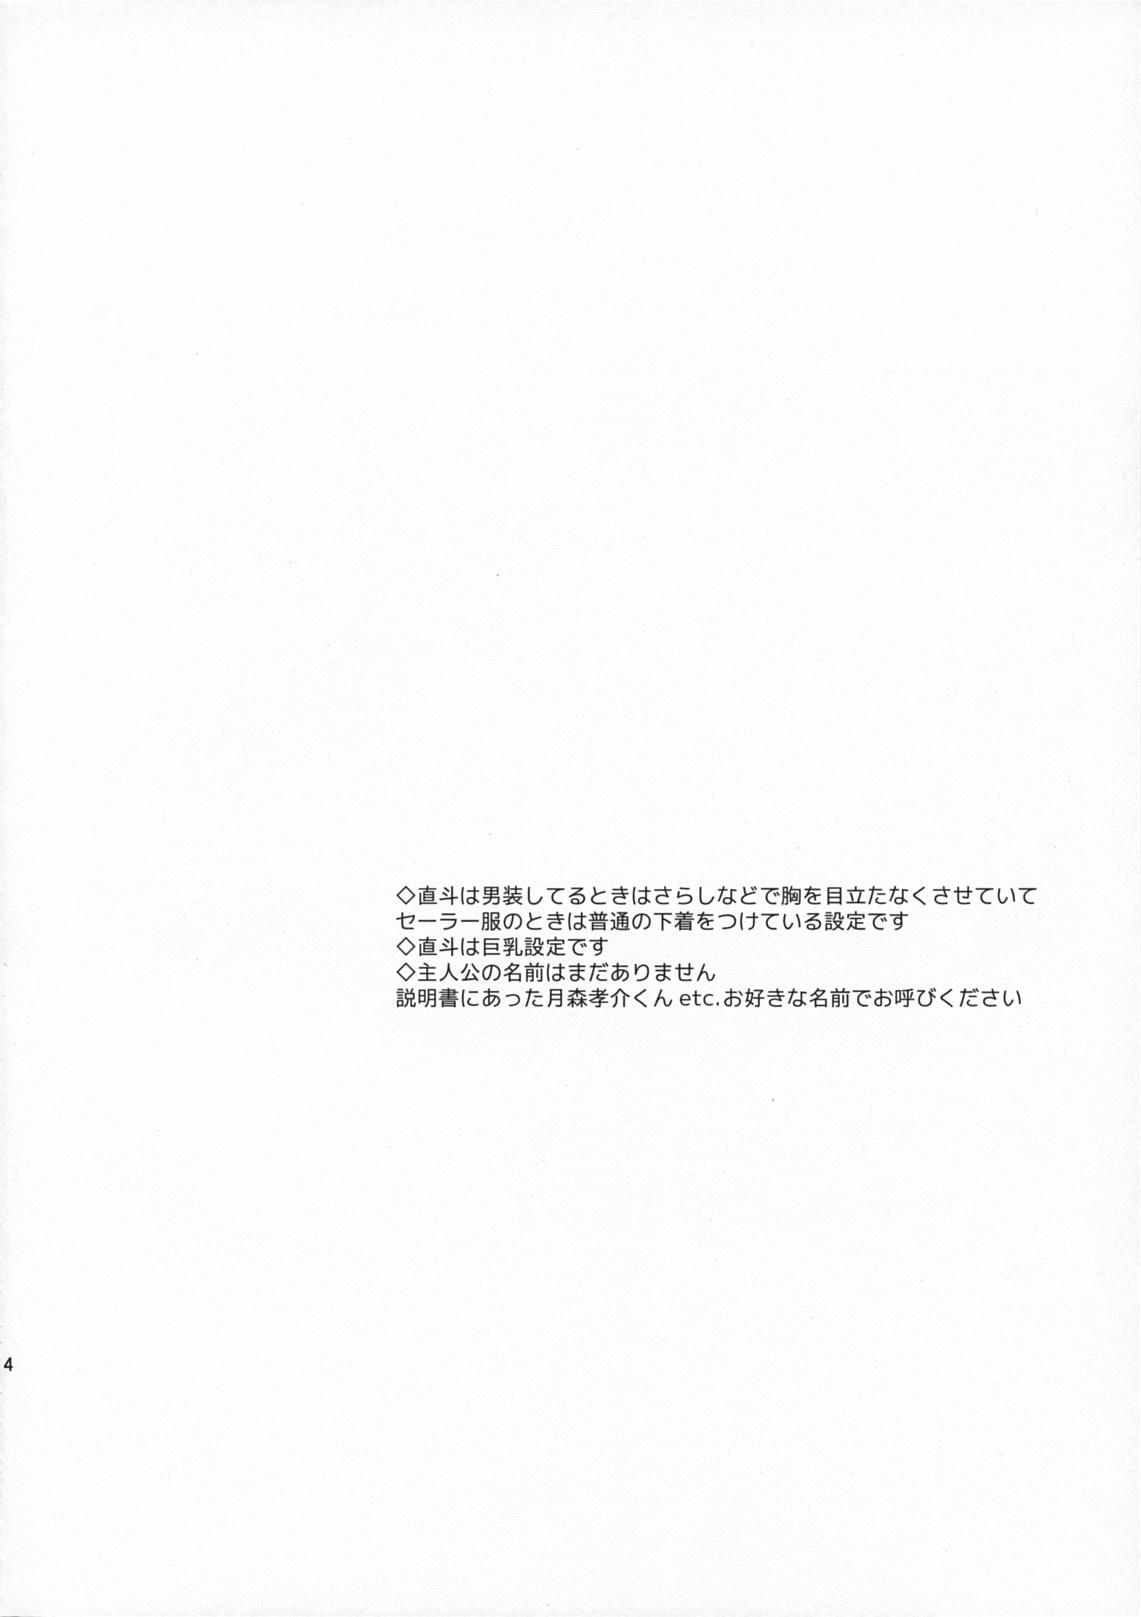 63280_kurimomo_www.hentairules.net_03_123_861lo.jpg